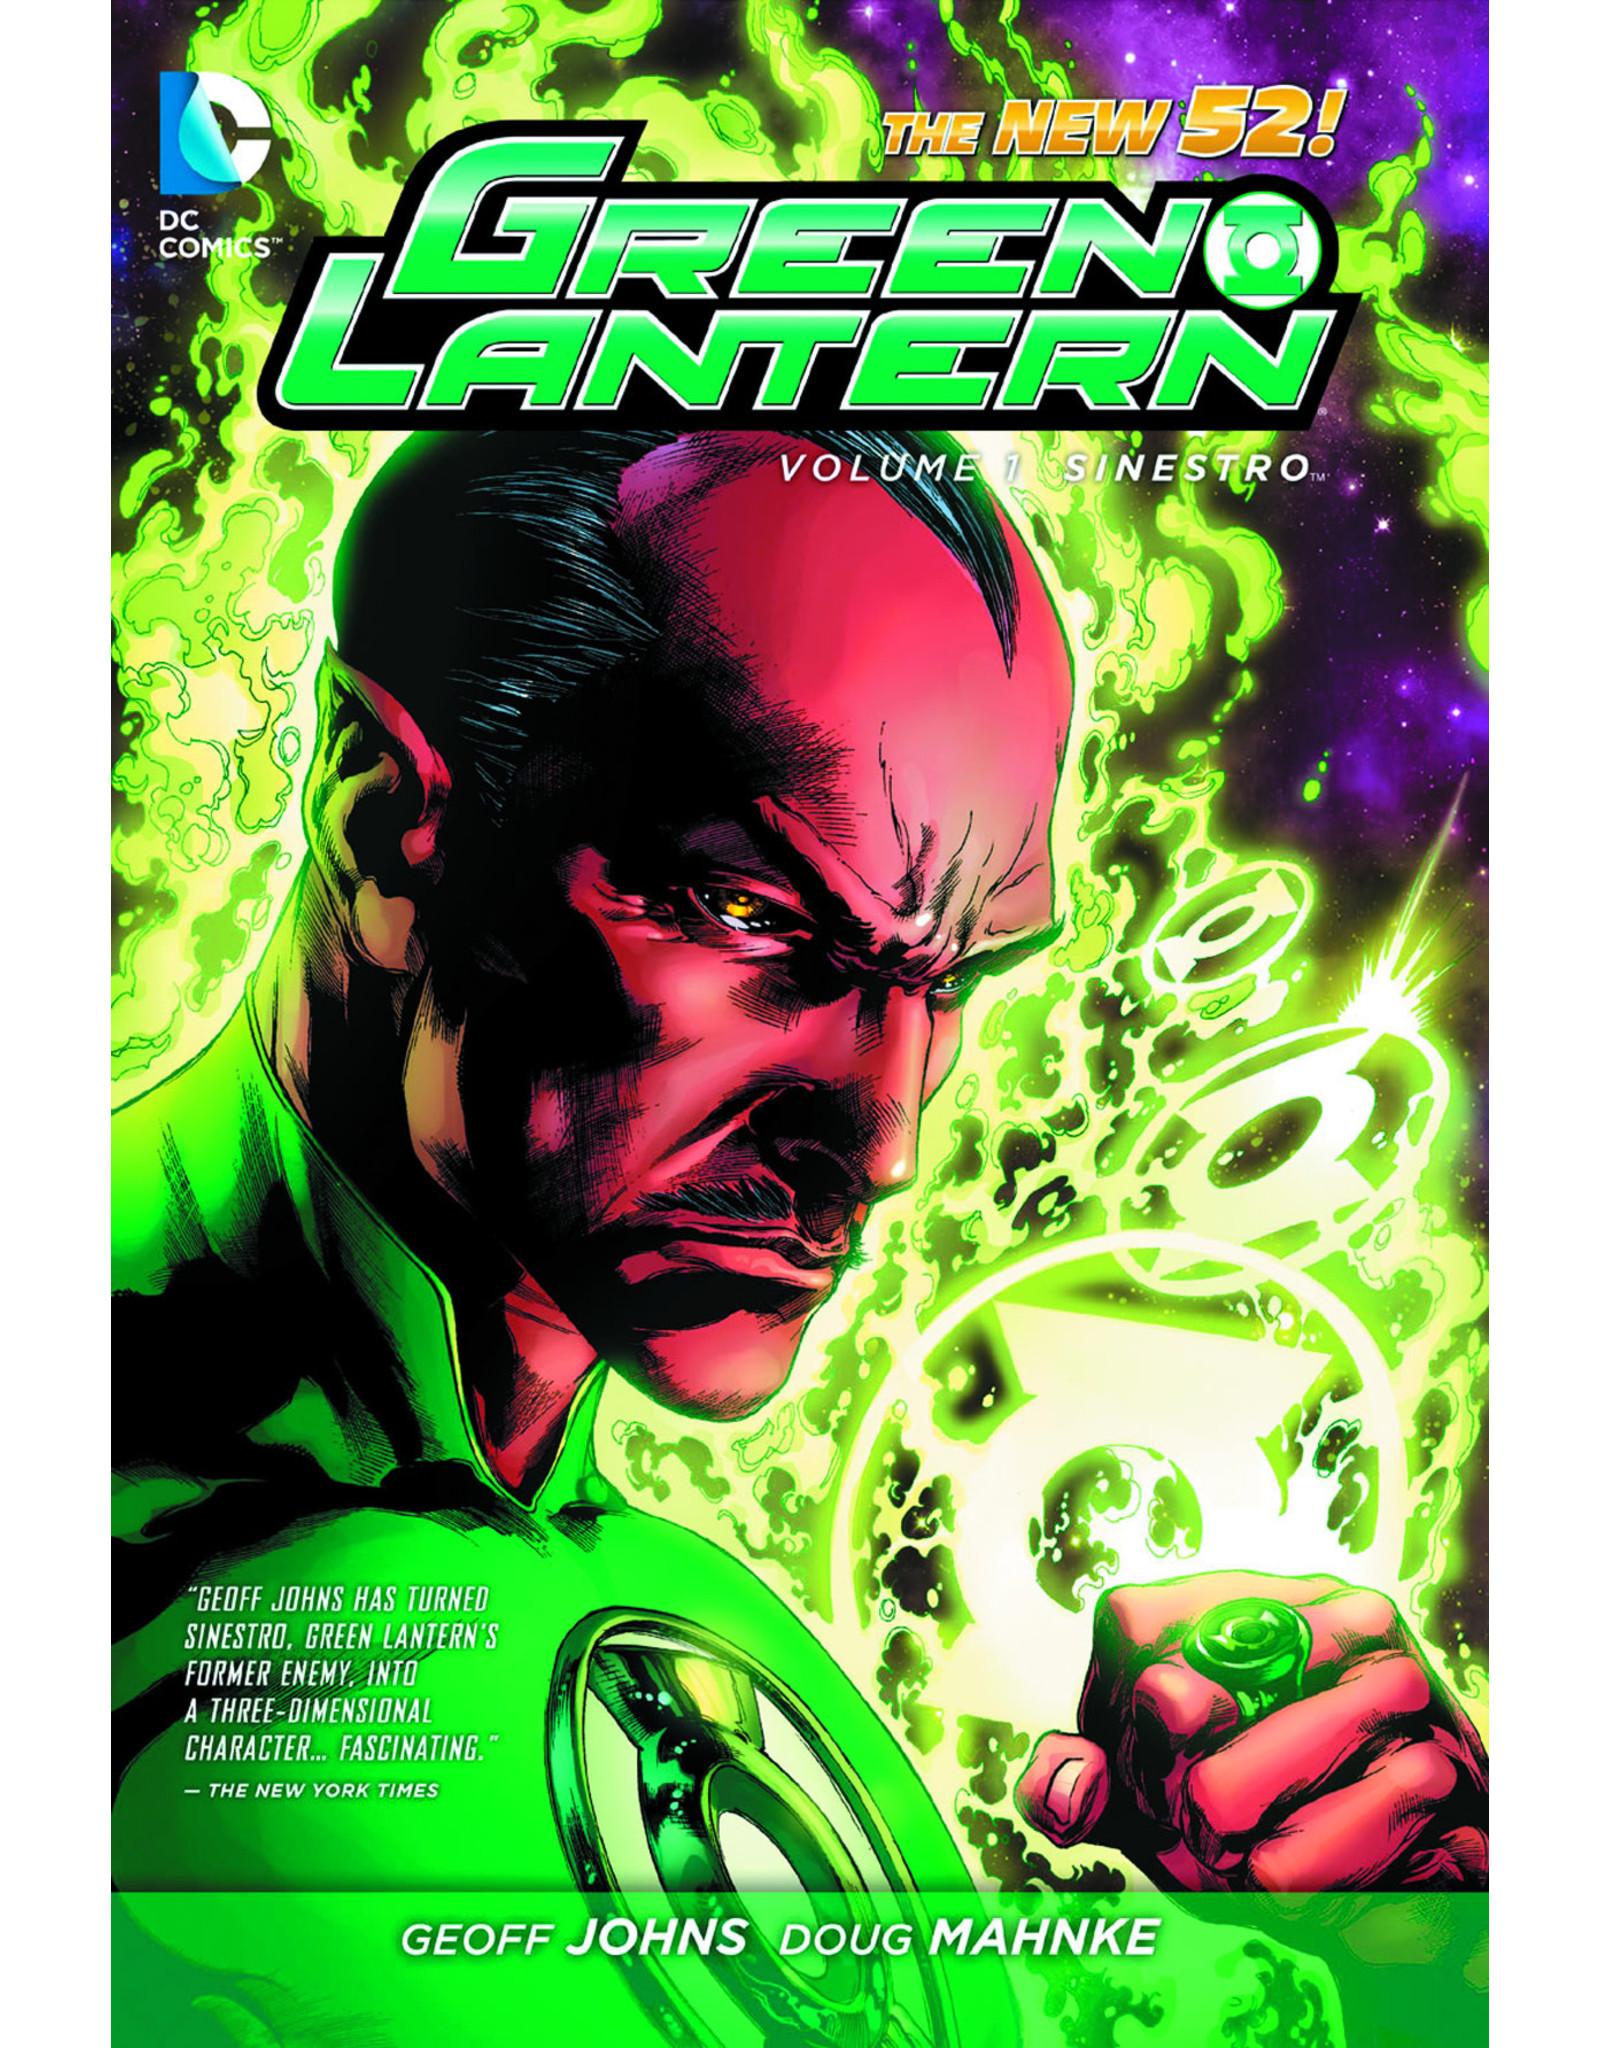 DC COMICS GREEN LANTERN HC VOL 01 SINESTRO